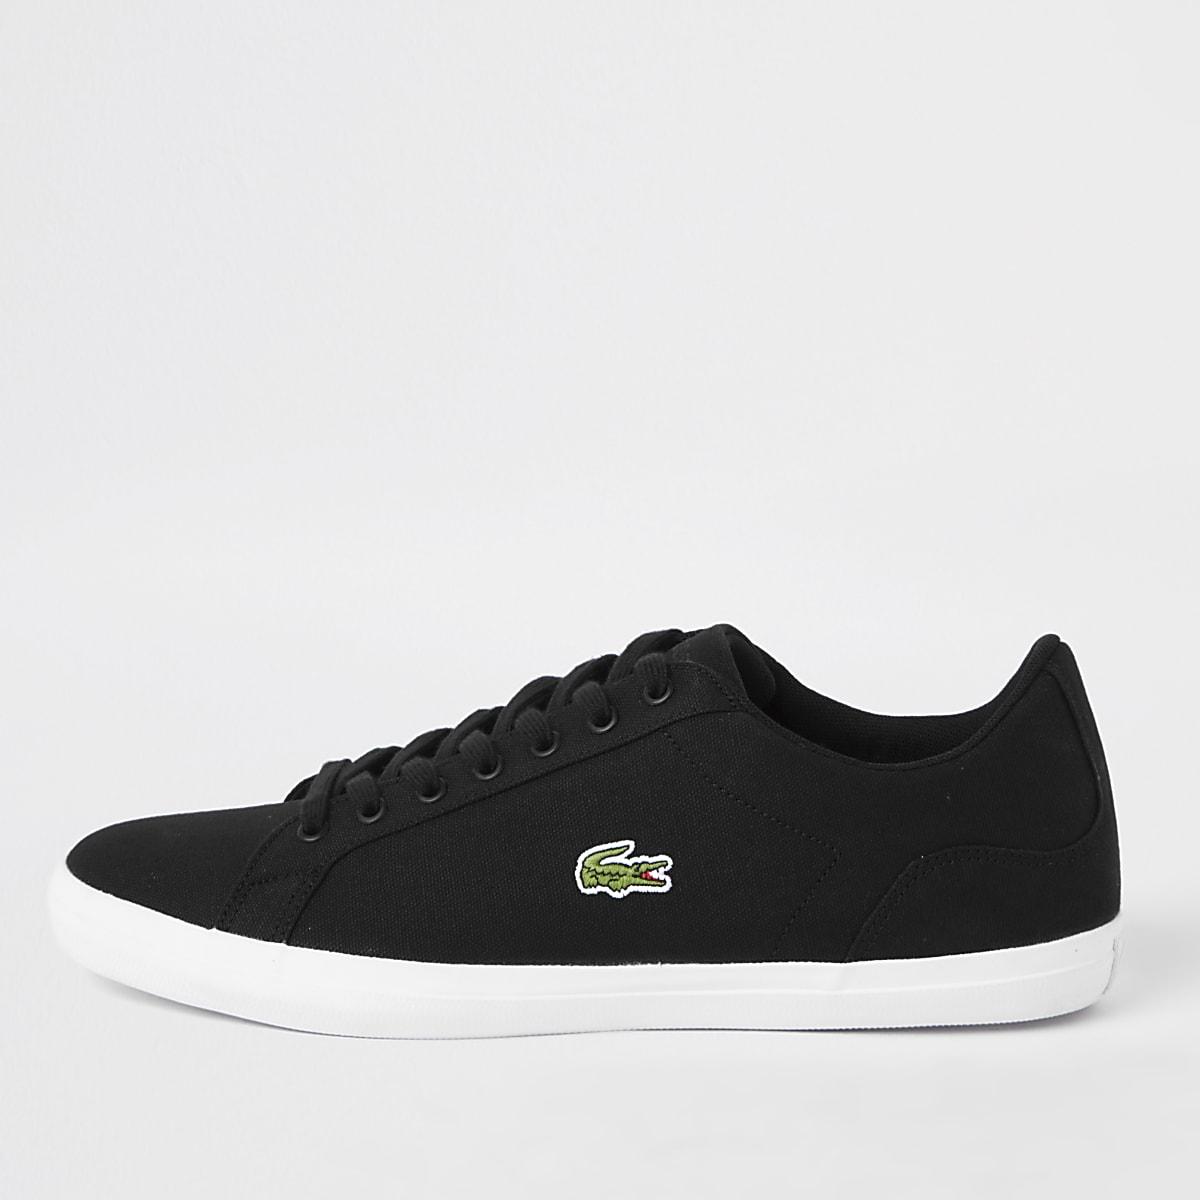 Lacoste Lerond black trainers